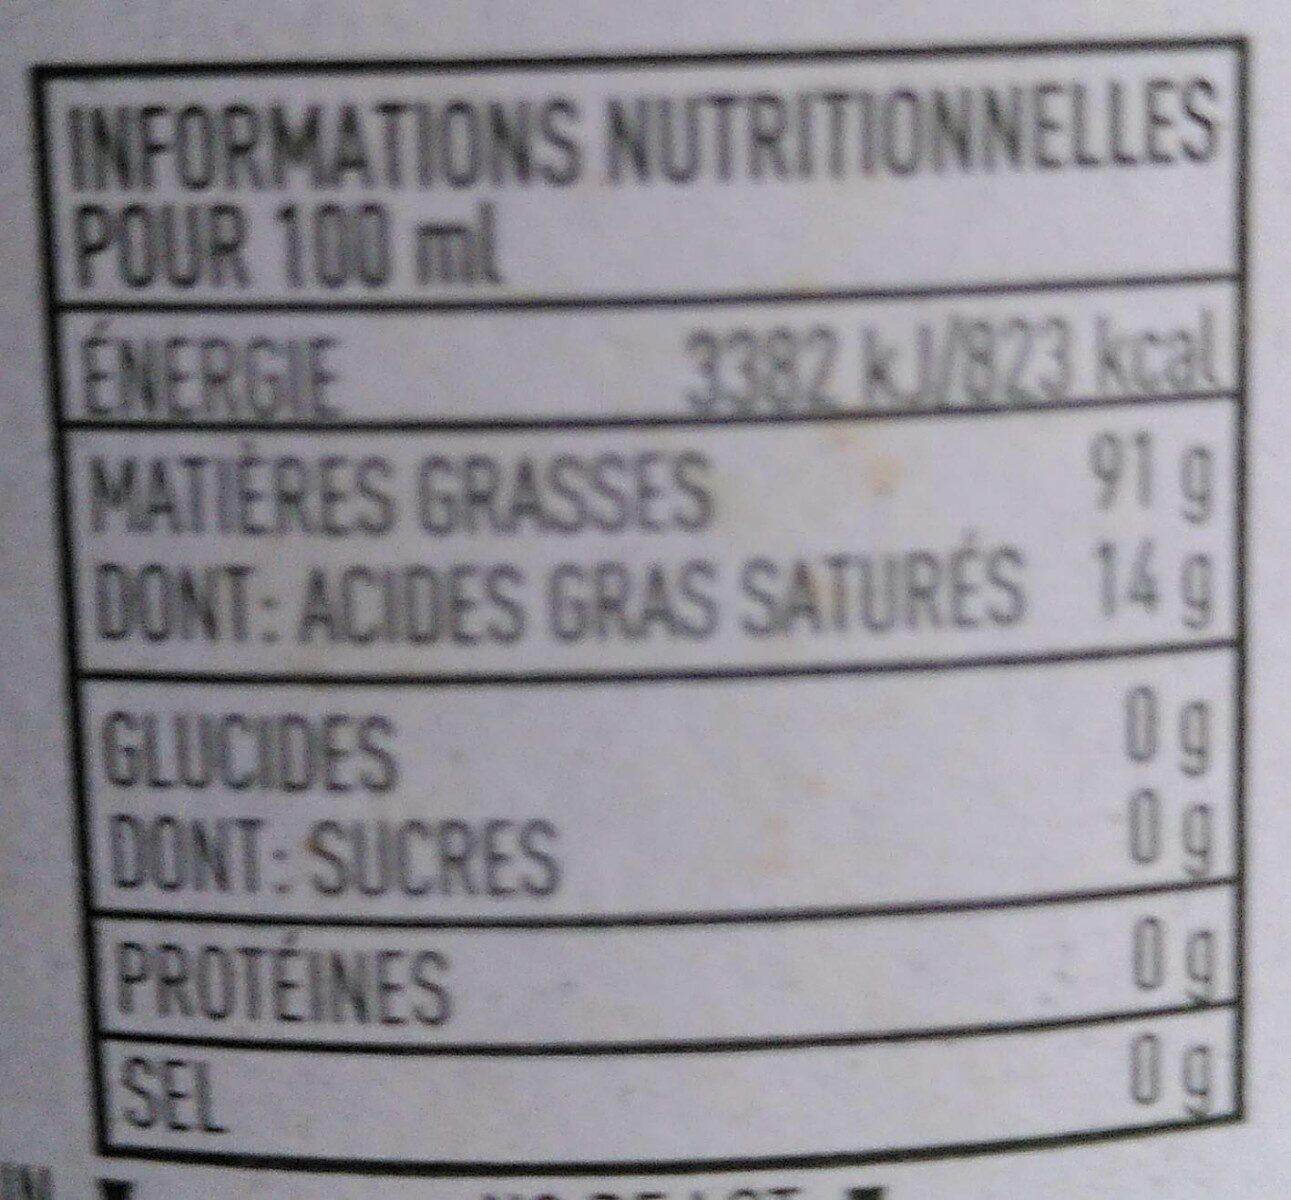 Huile d'olive vierge extra Bio Delicato 75 CL - Informations nutritionnelles - fr